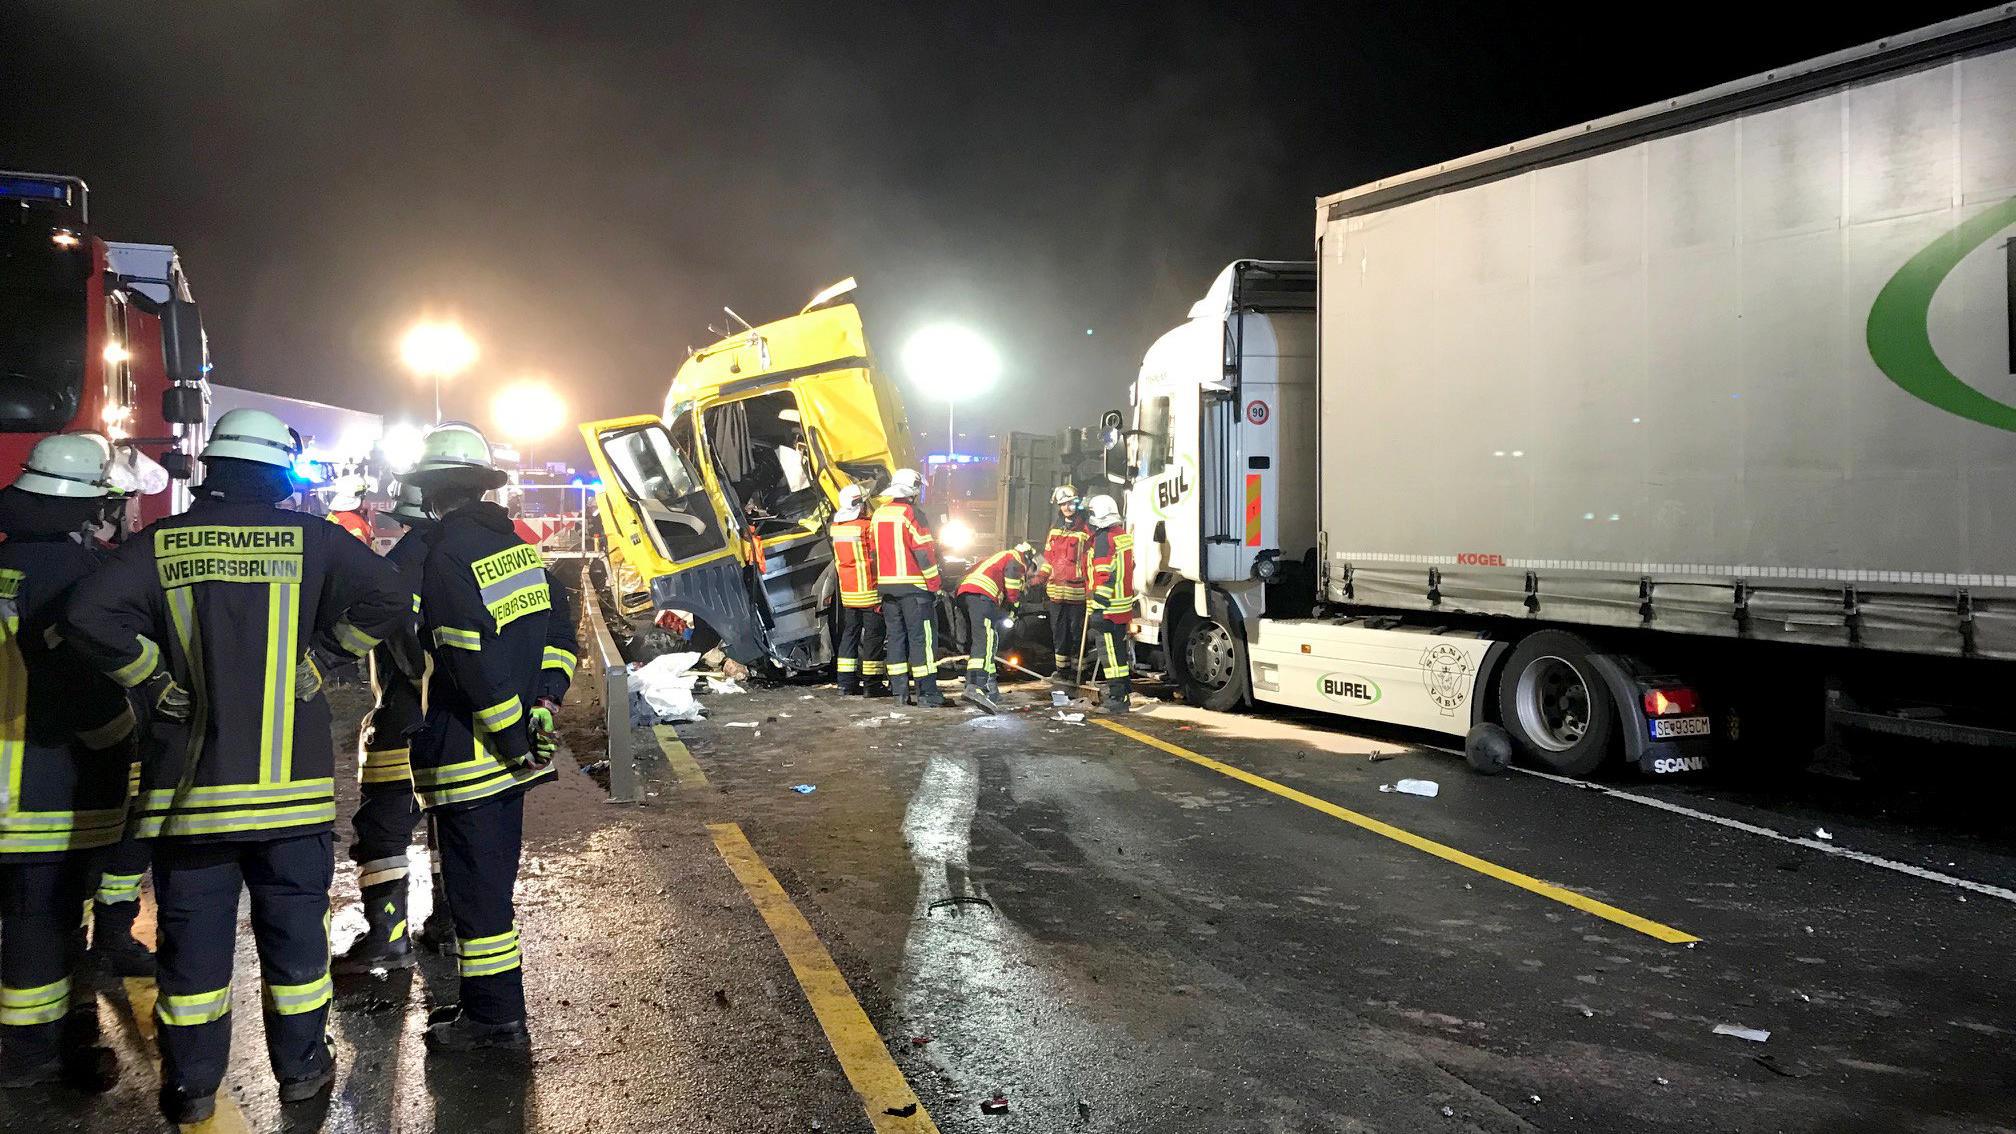 Fantastisch Verkehrsunfall Szene Ideen - Die Besten Elektrischen ...